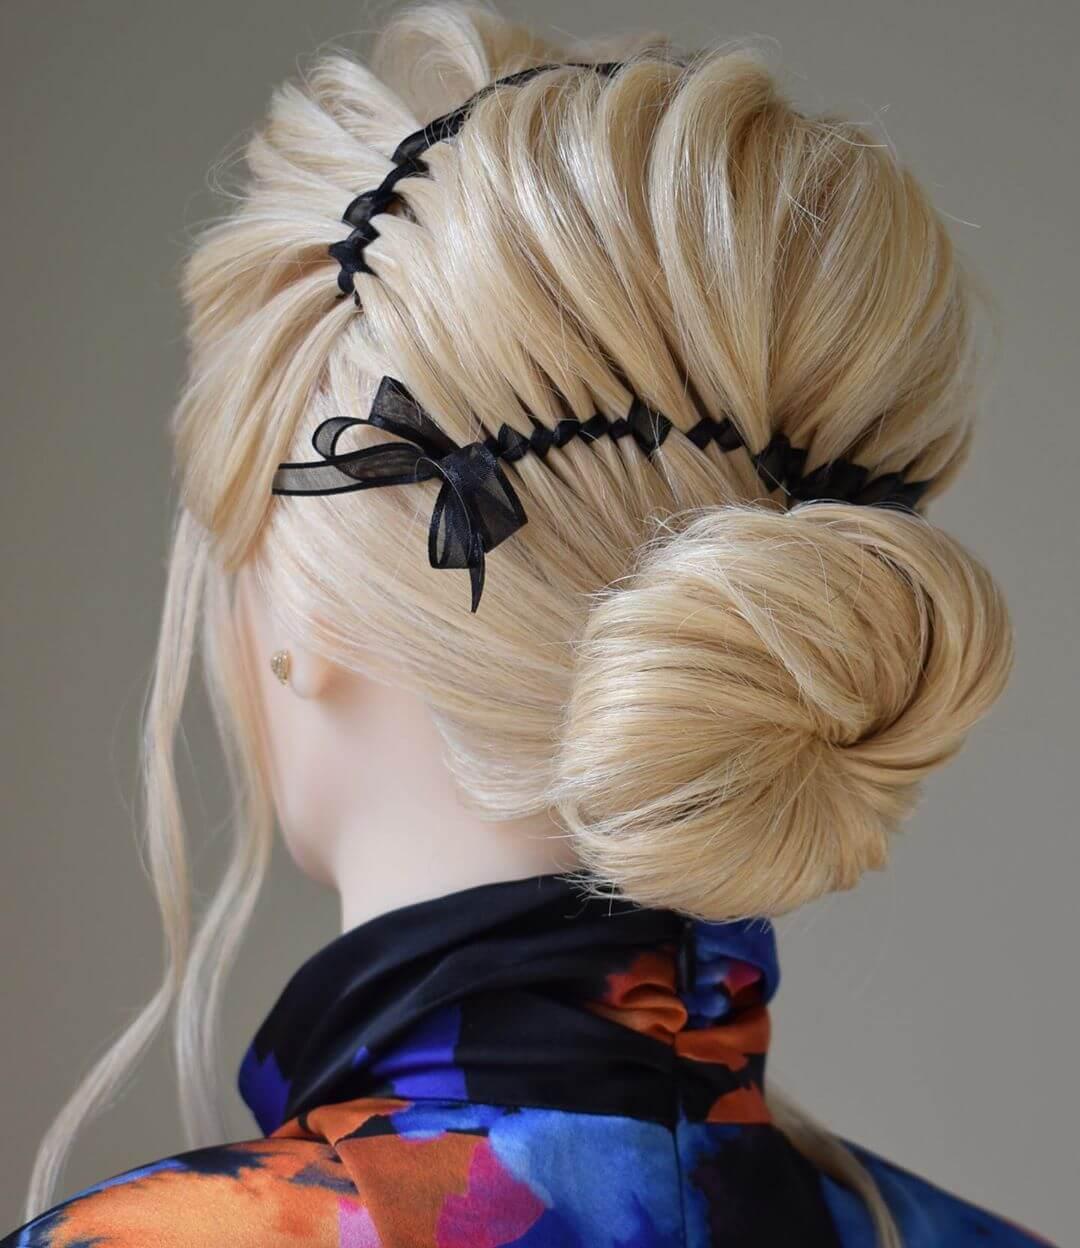 Stylish Updo With Black Ribbon